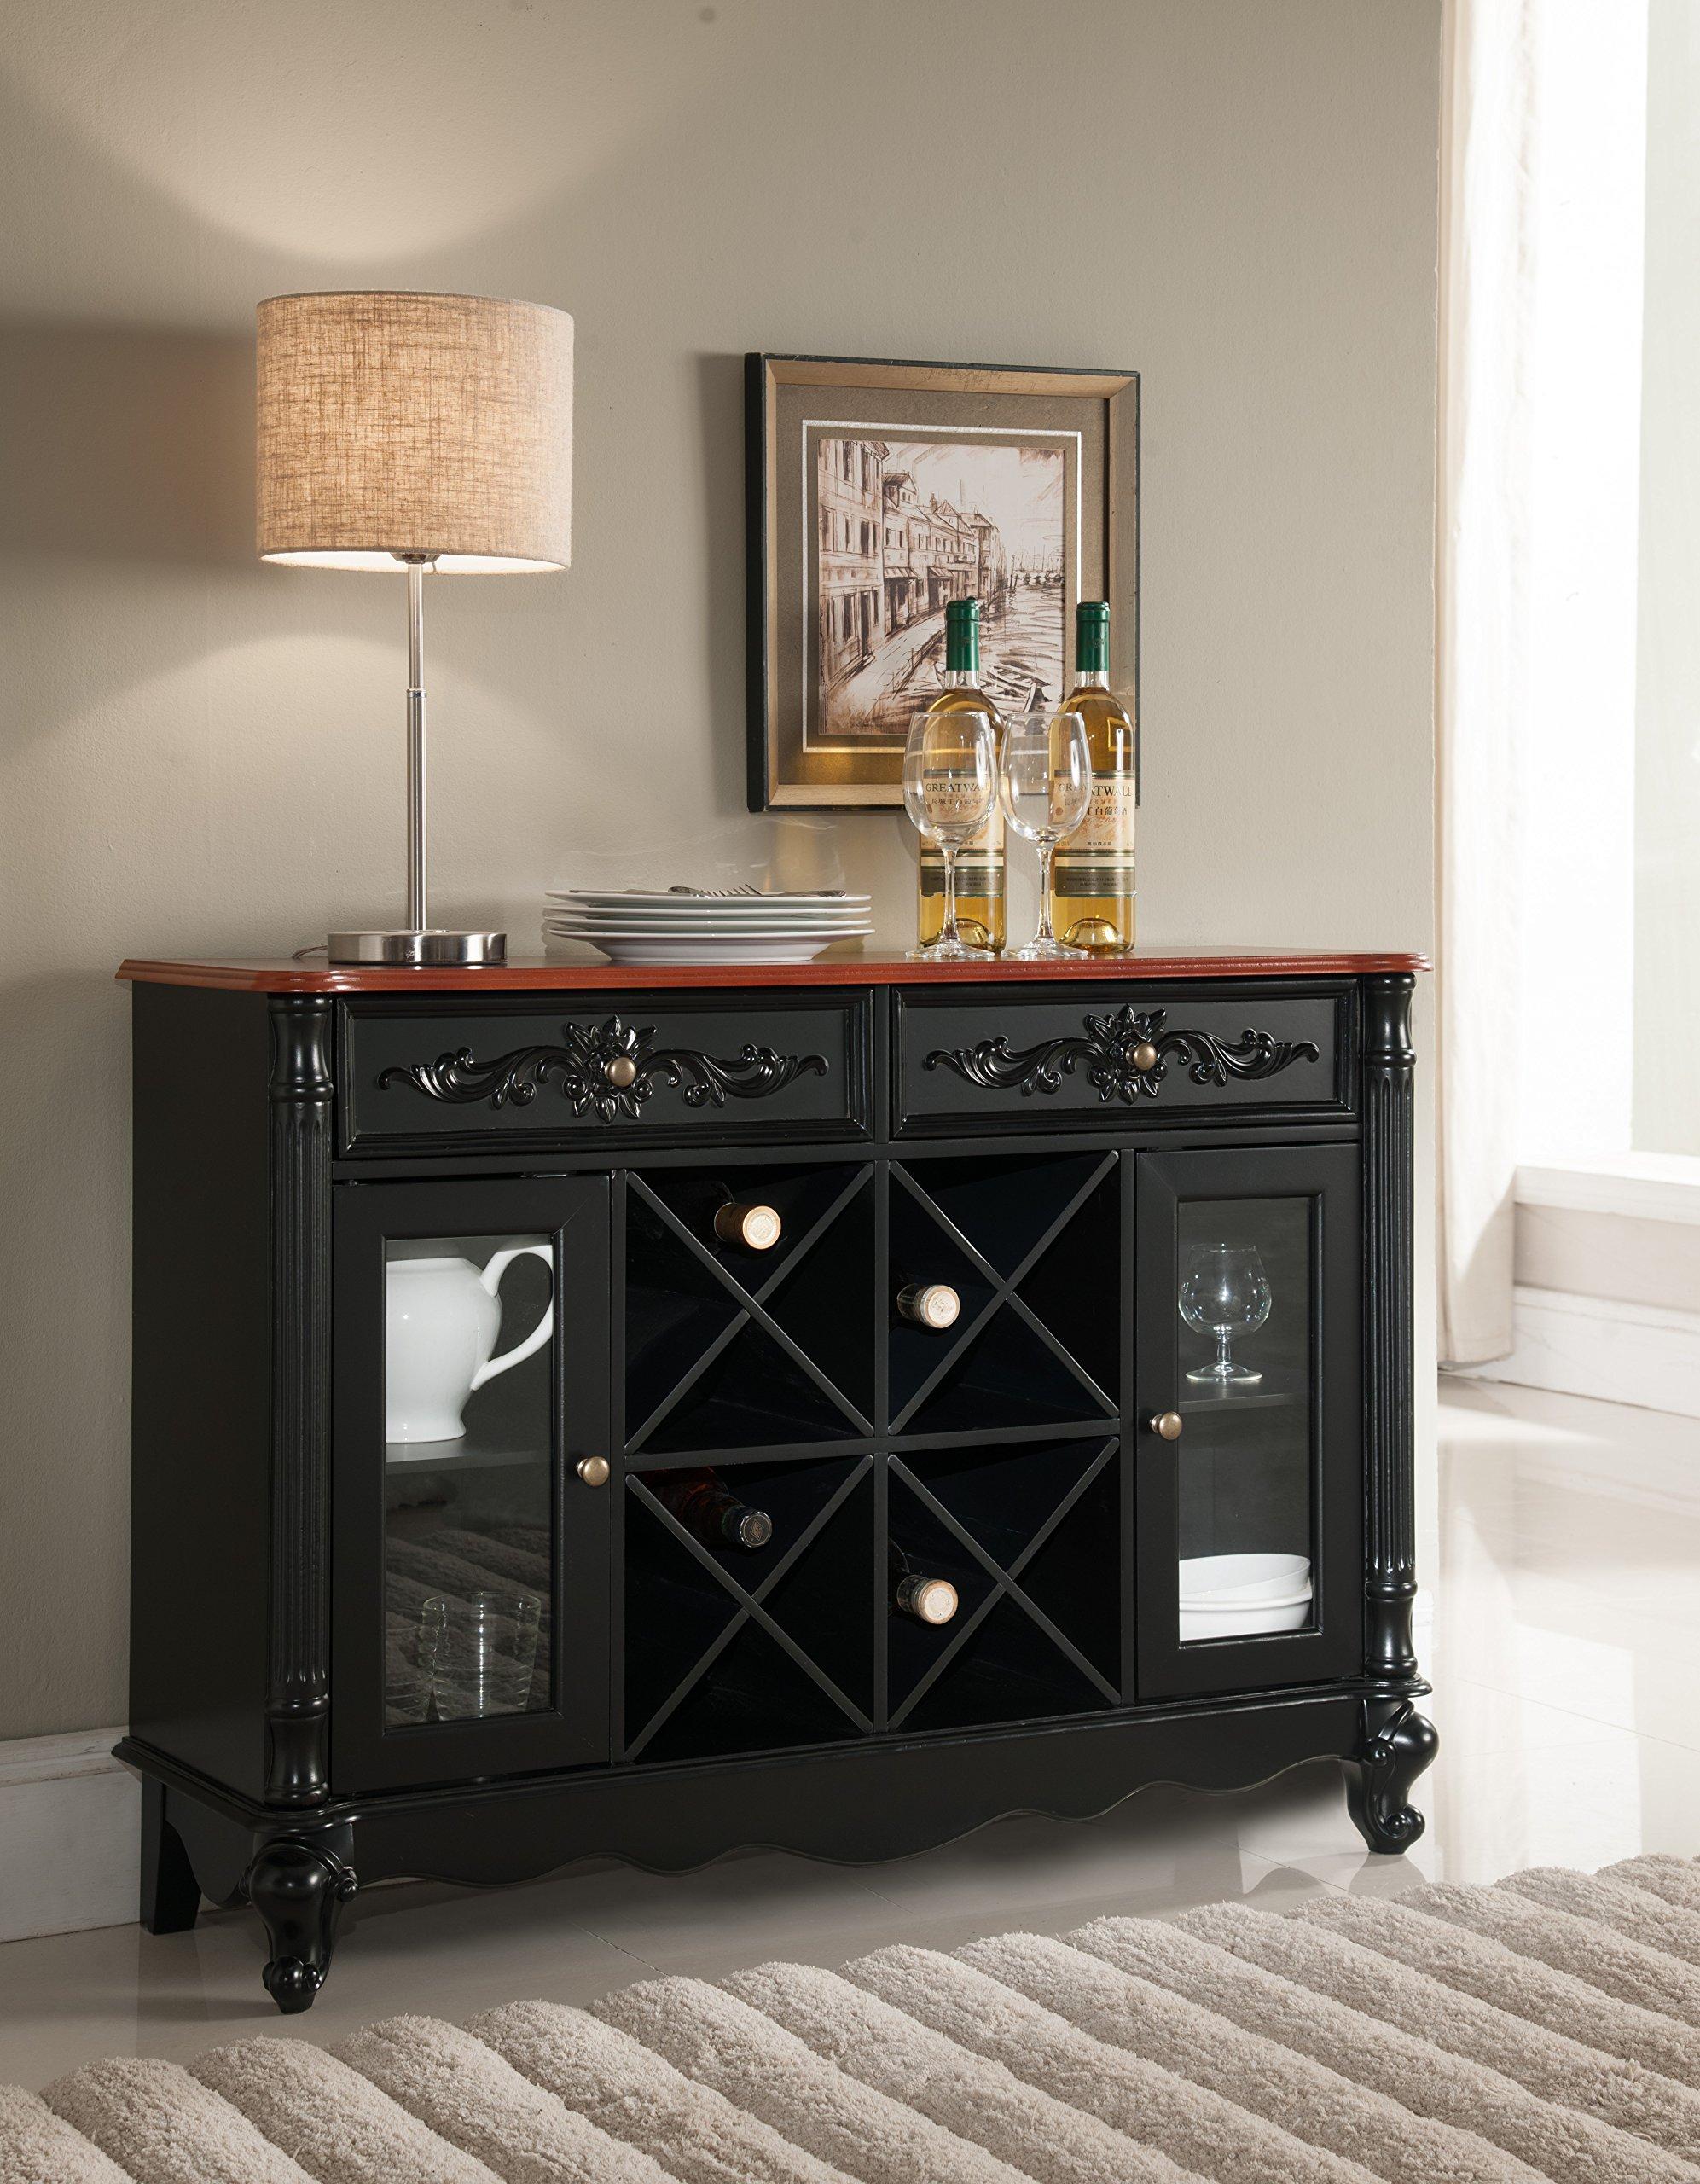 Kings Brand Buffet Server Wine Cabinet Console Table, Black/Walnut